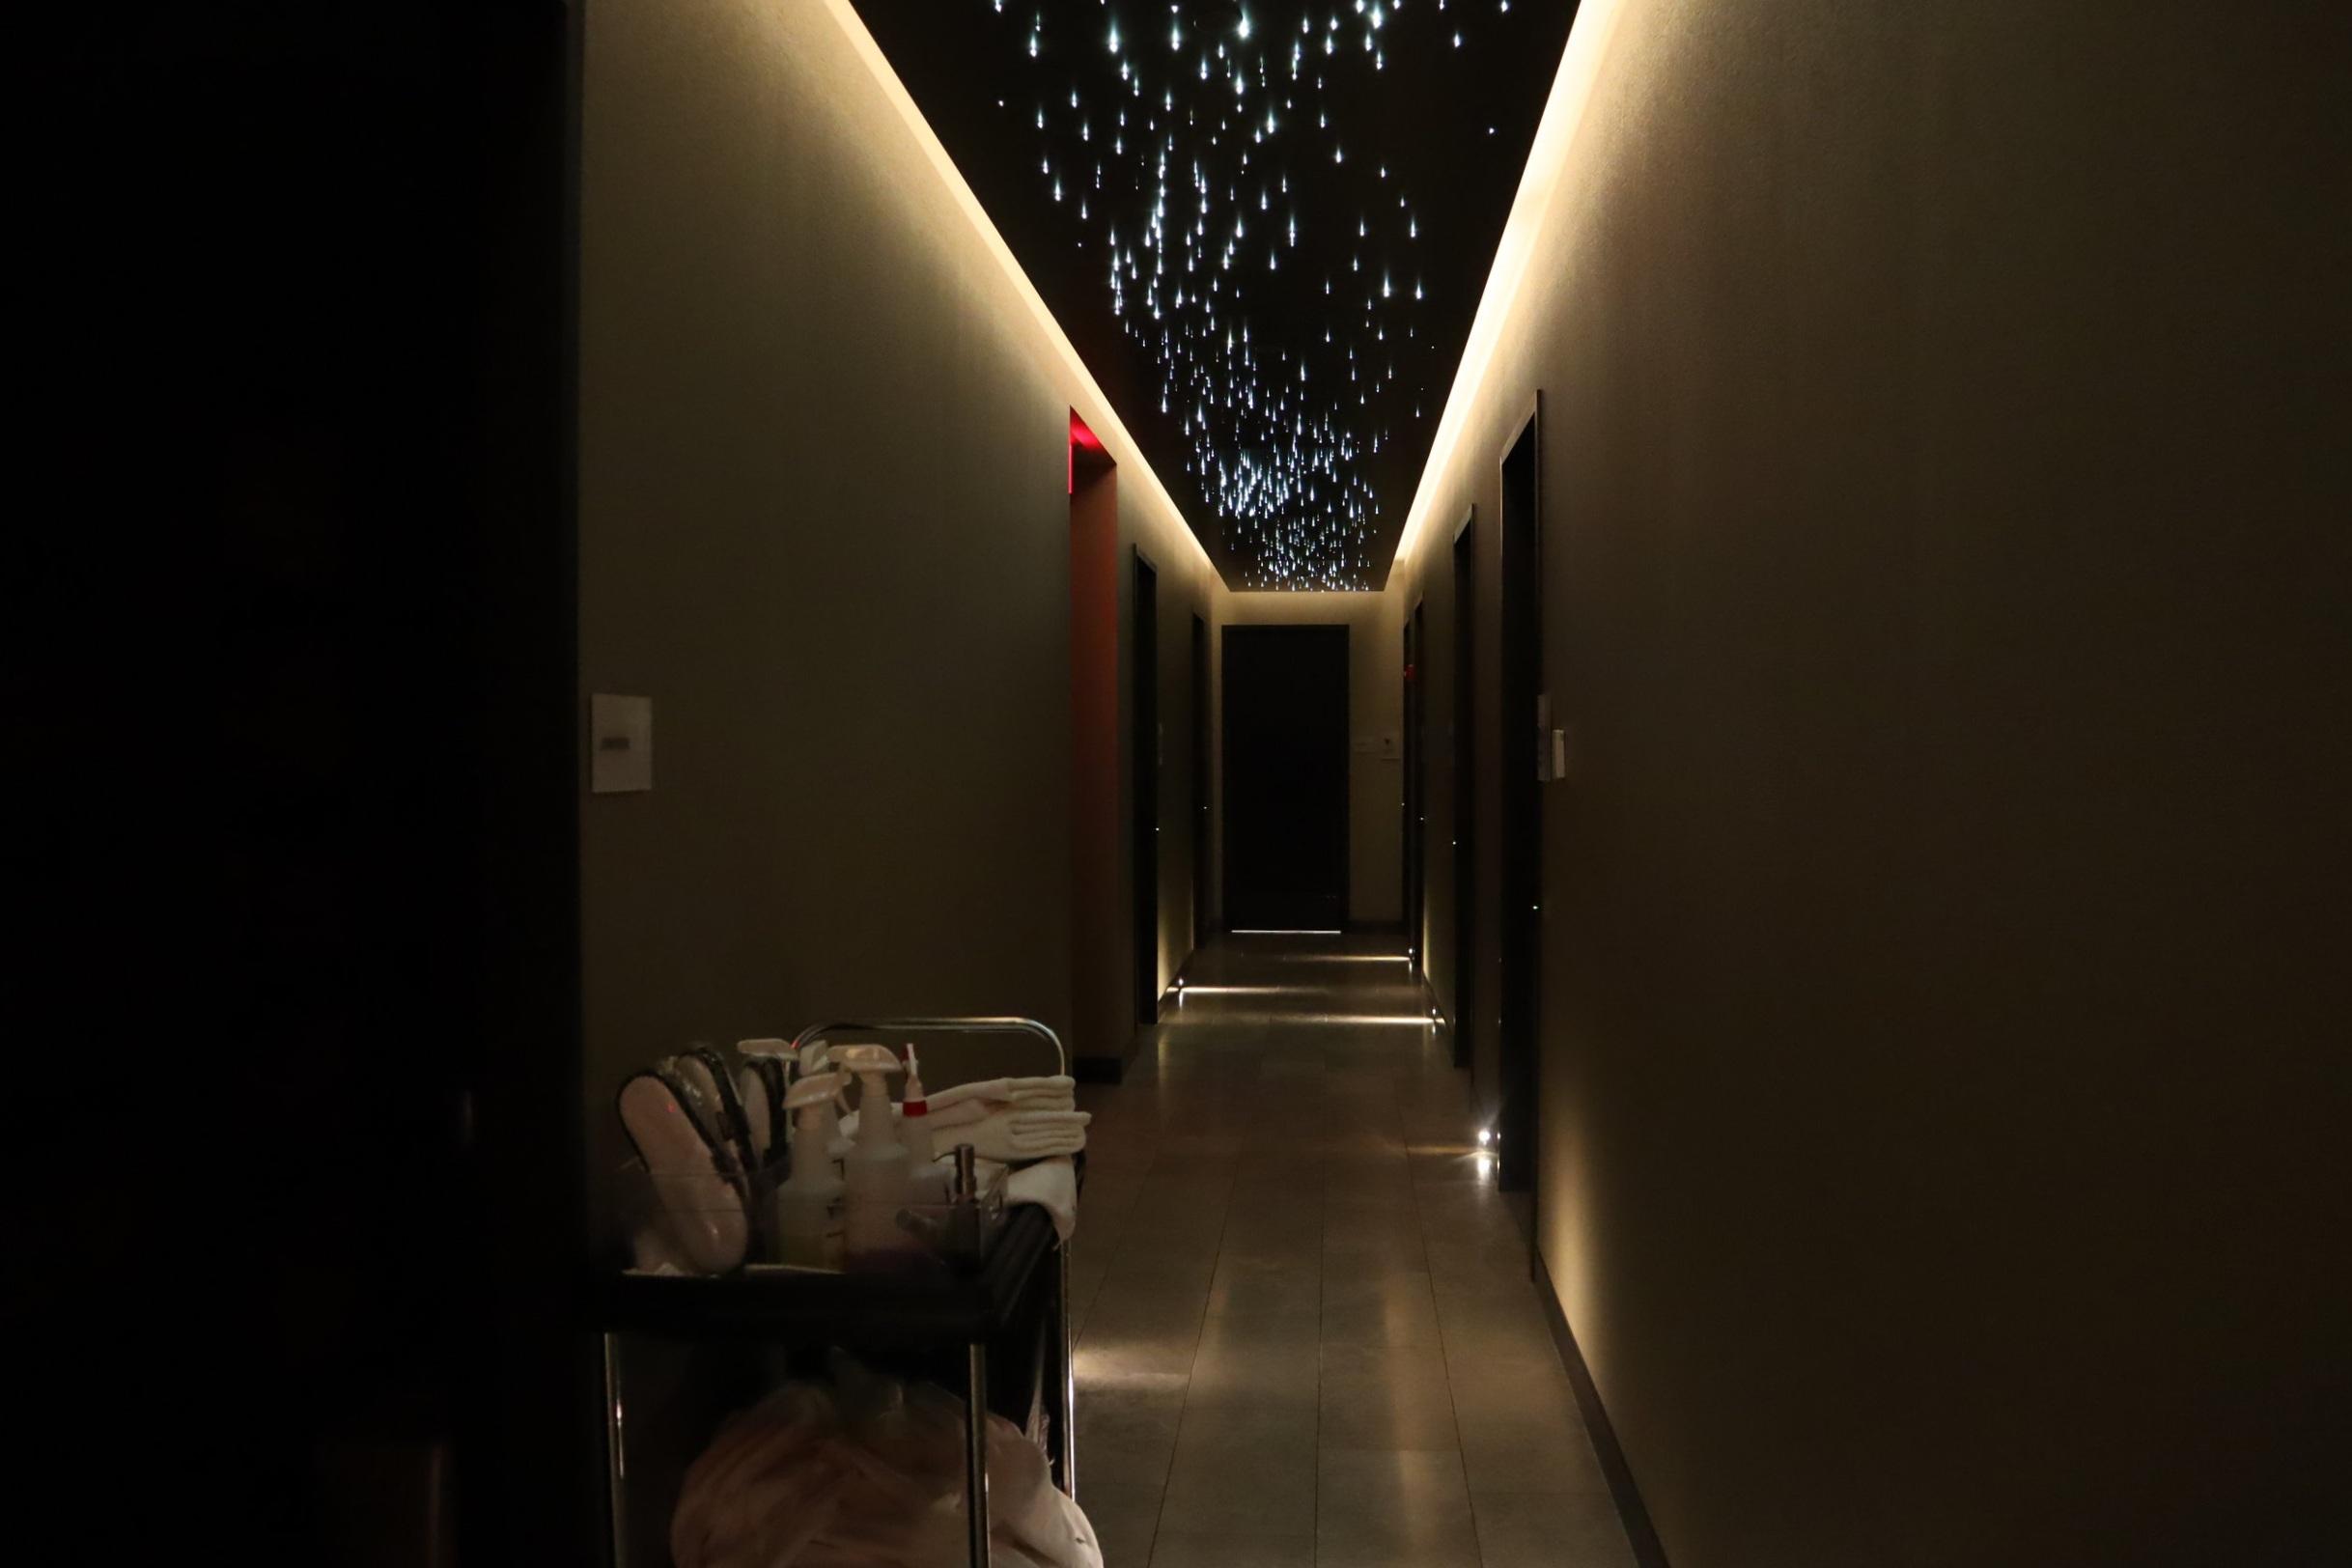 United Polaris Lounge Newark – Hallway to shower suites